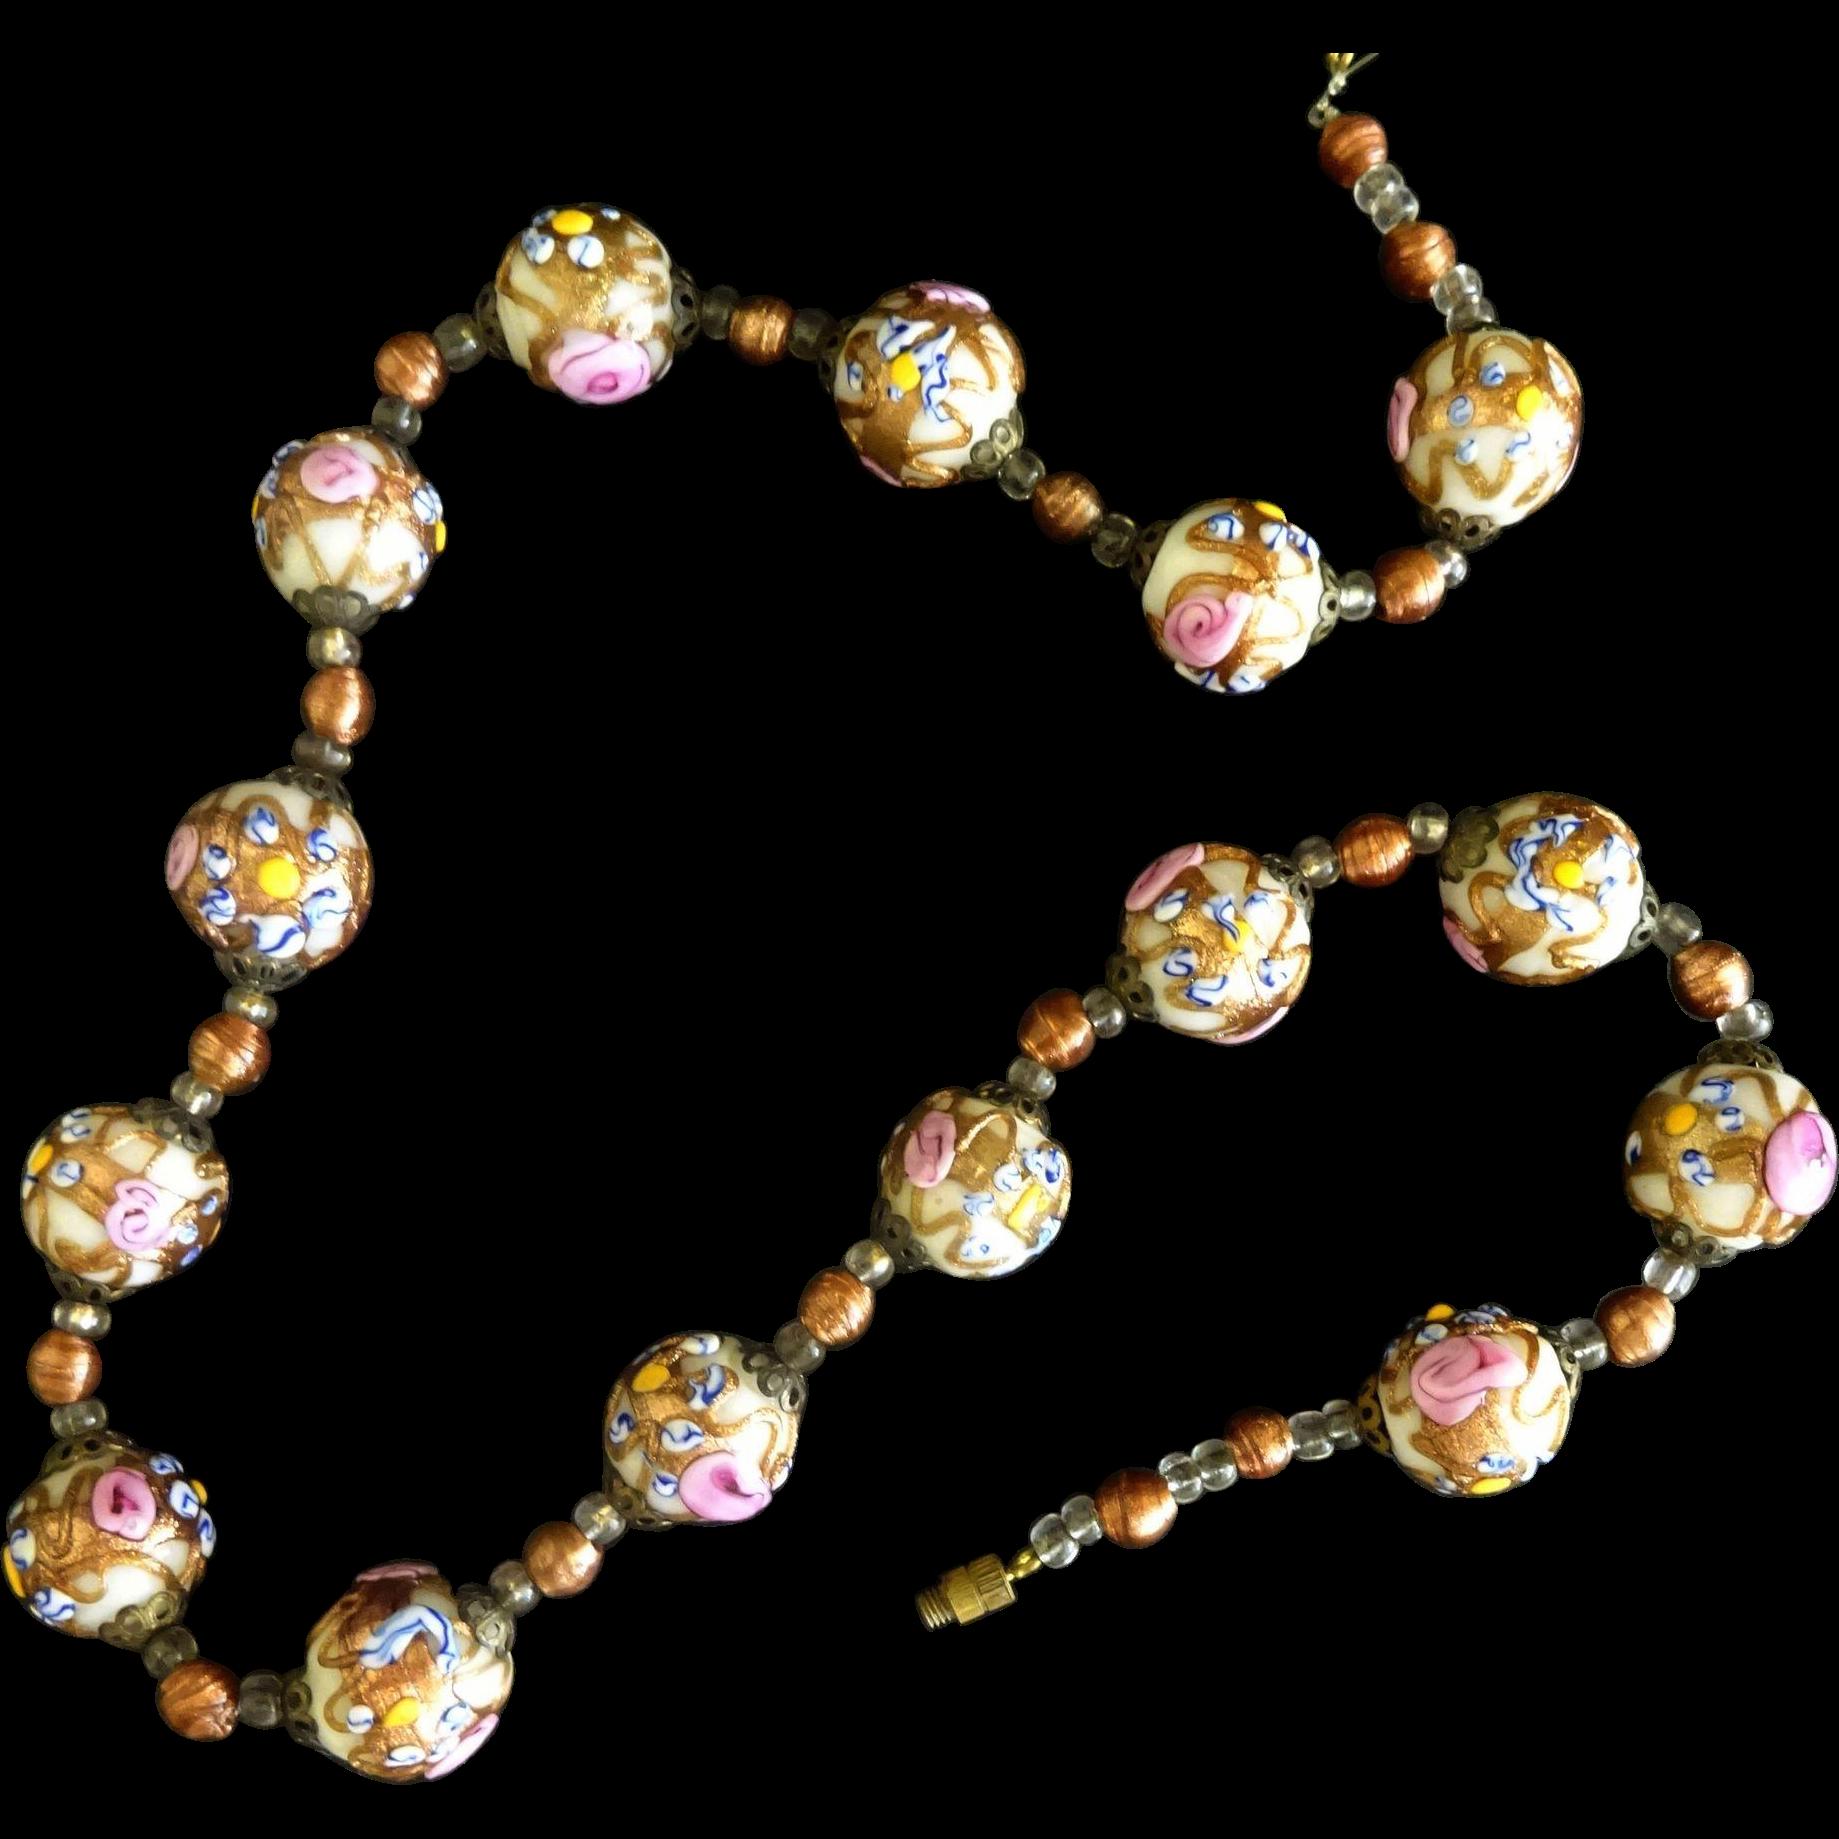 beads venice - photo#15